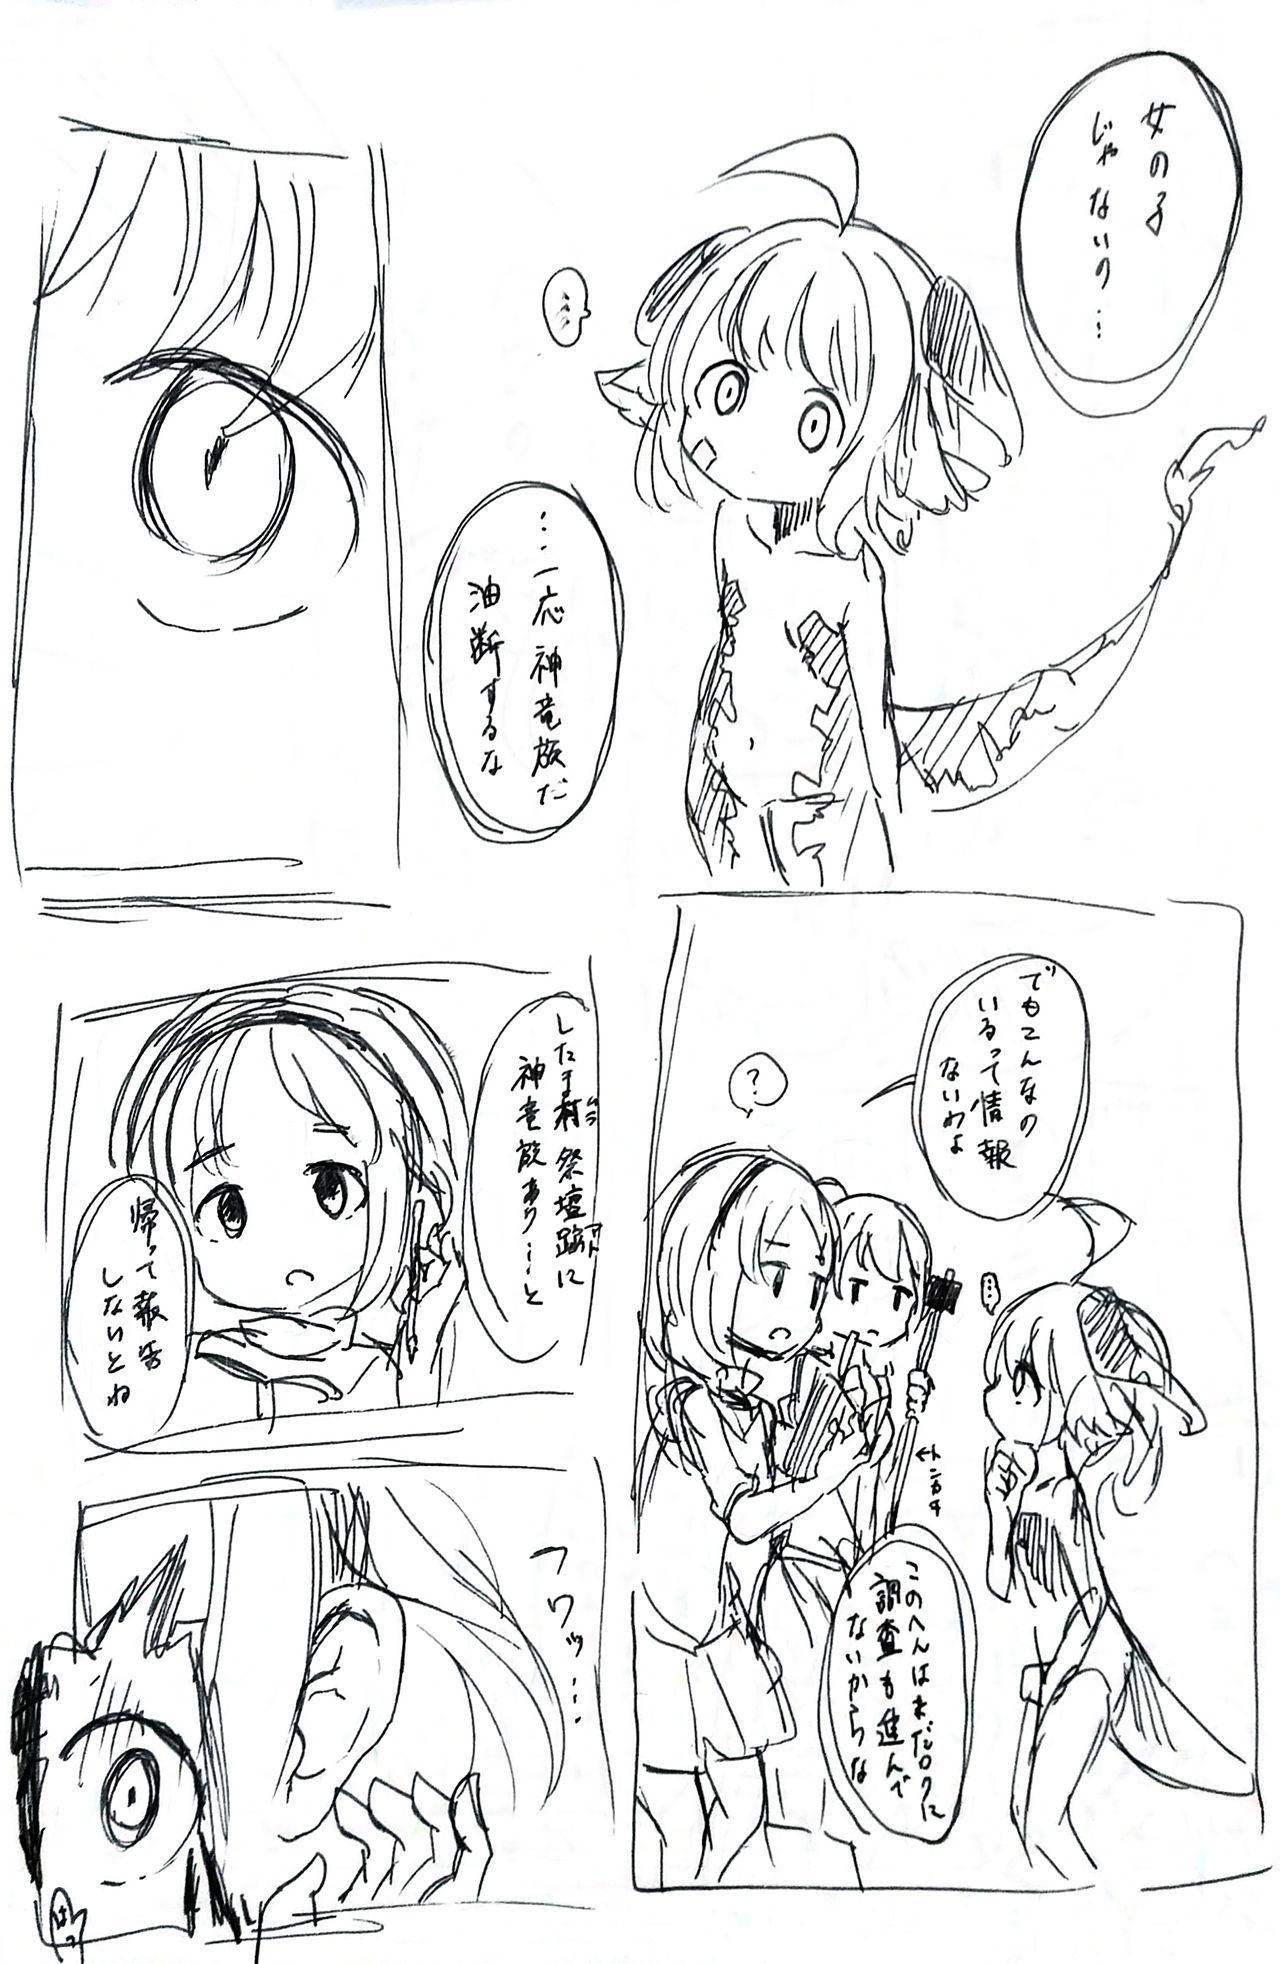 Hisui-chan carnival biyori 1